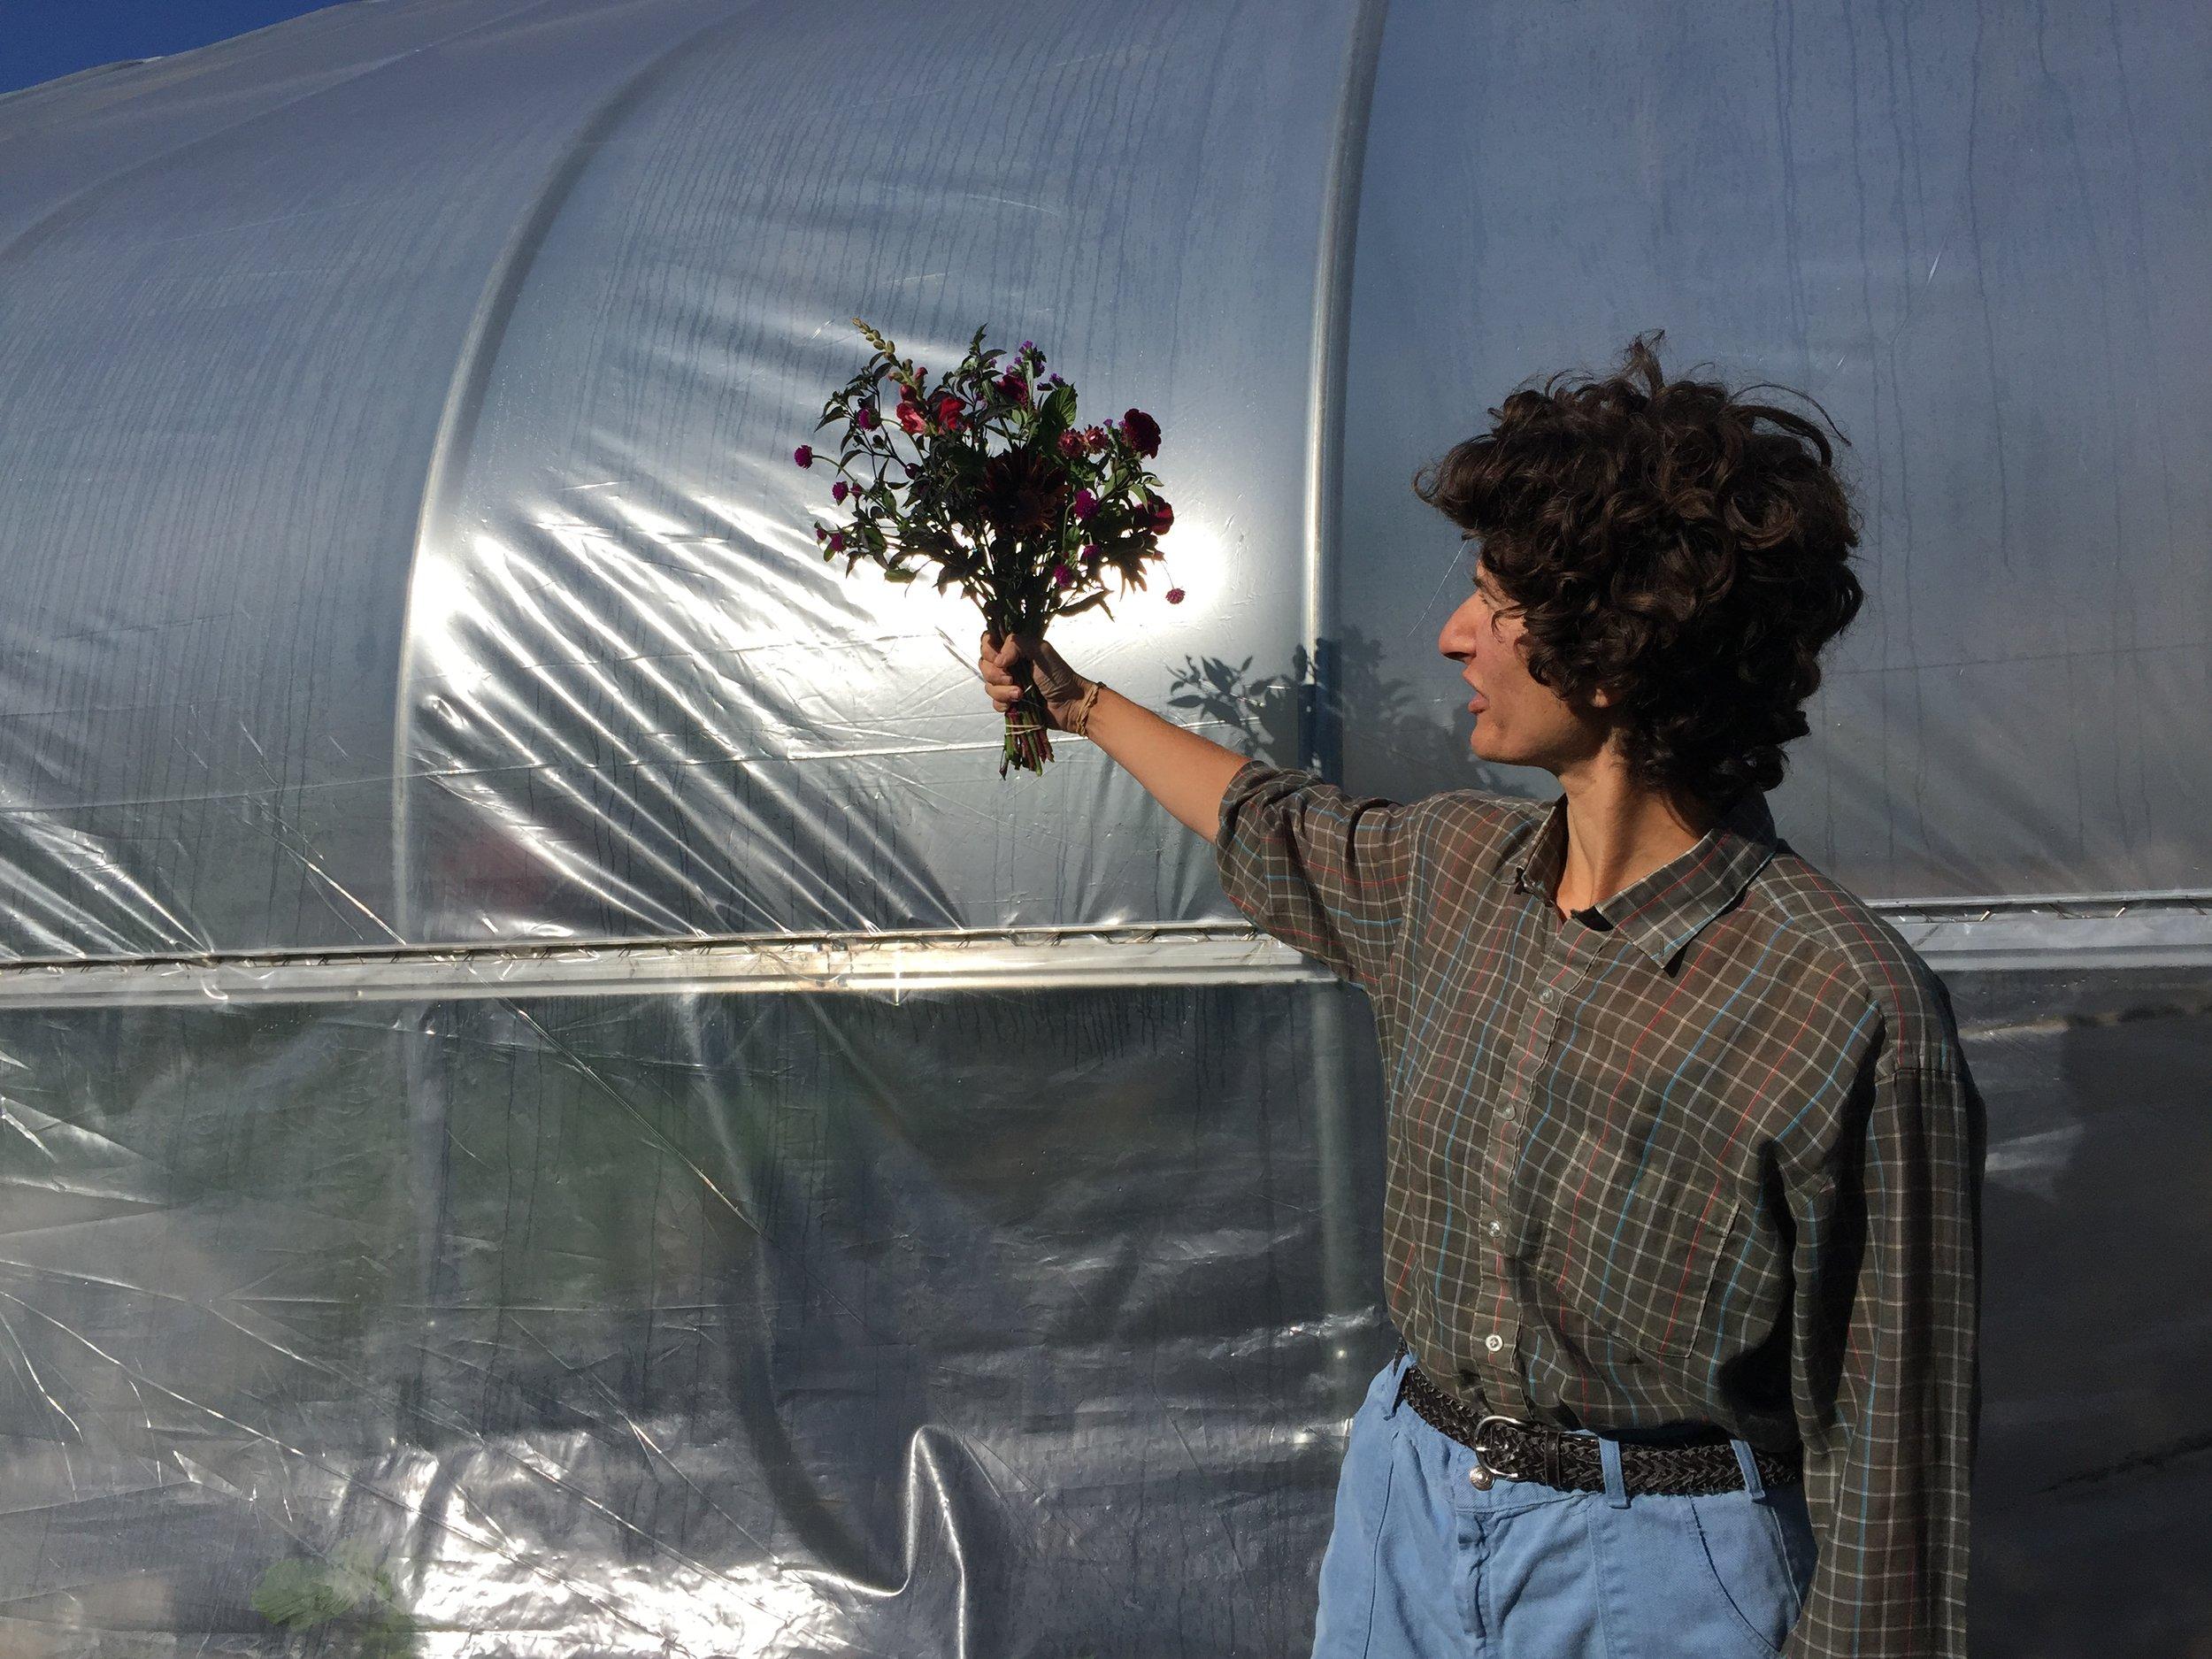 Farmer Sarah holds her work at arm's length.